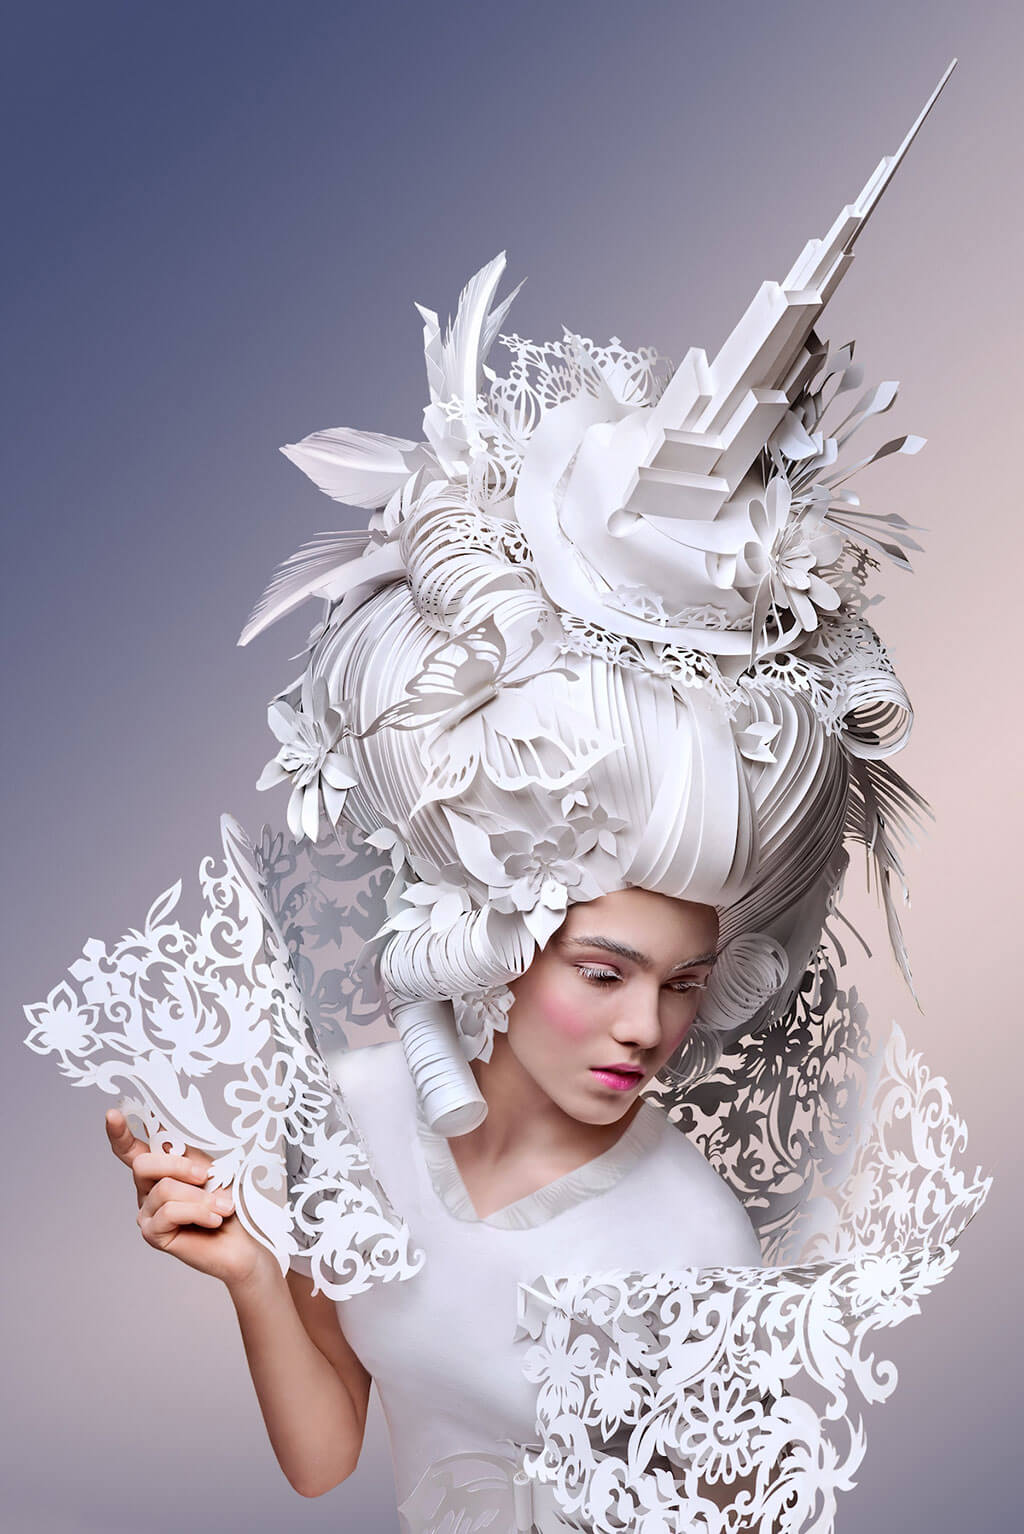 Baroque-inspired paper wigs by Asya Kozina and Dmitriy Kozin